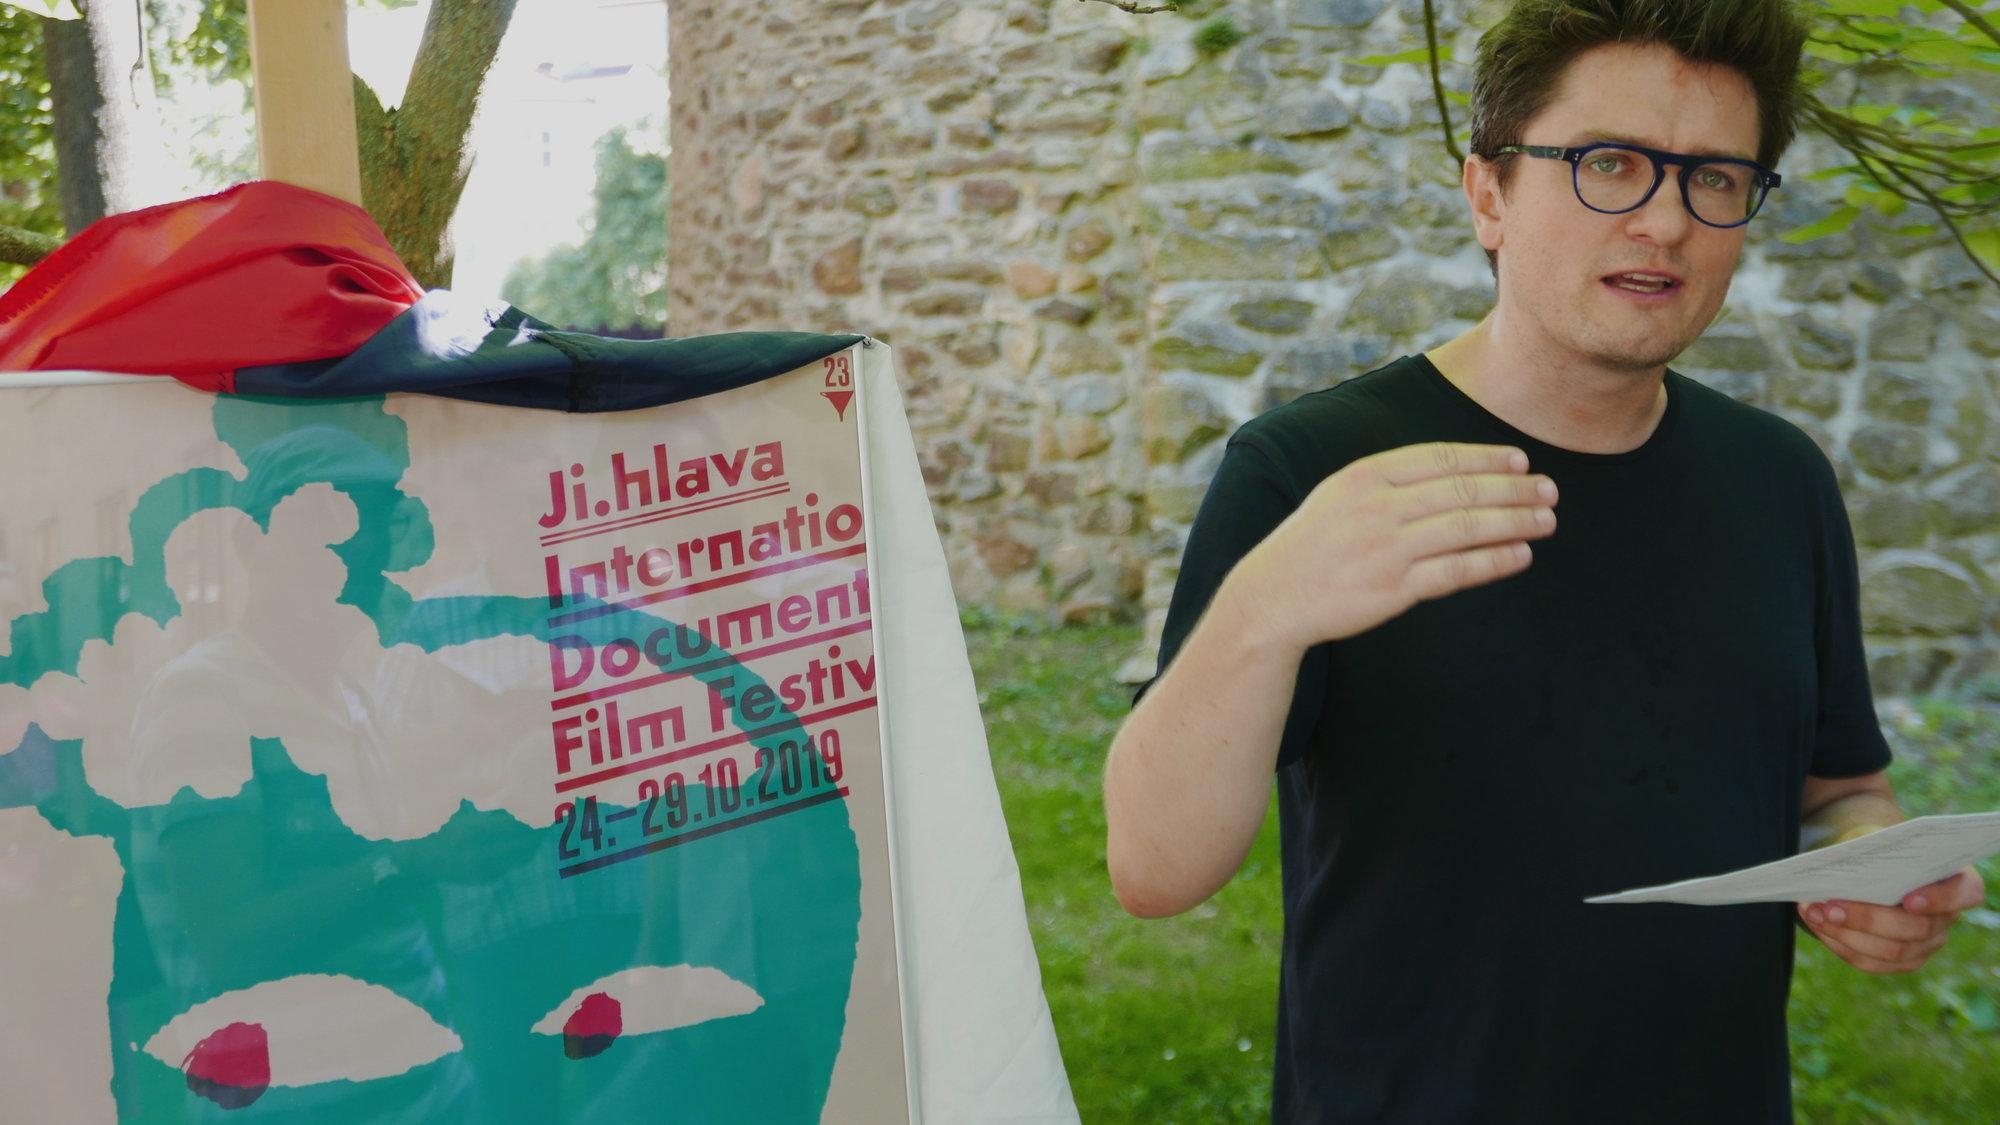 Ji.hlava IDFF: Thinking through films